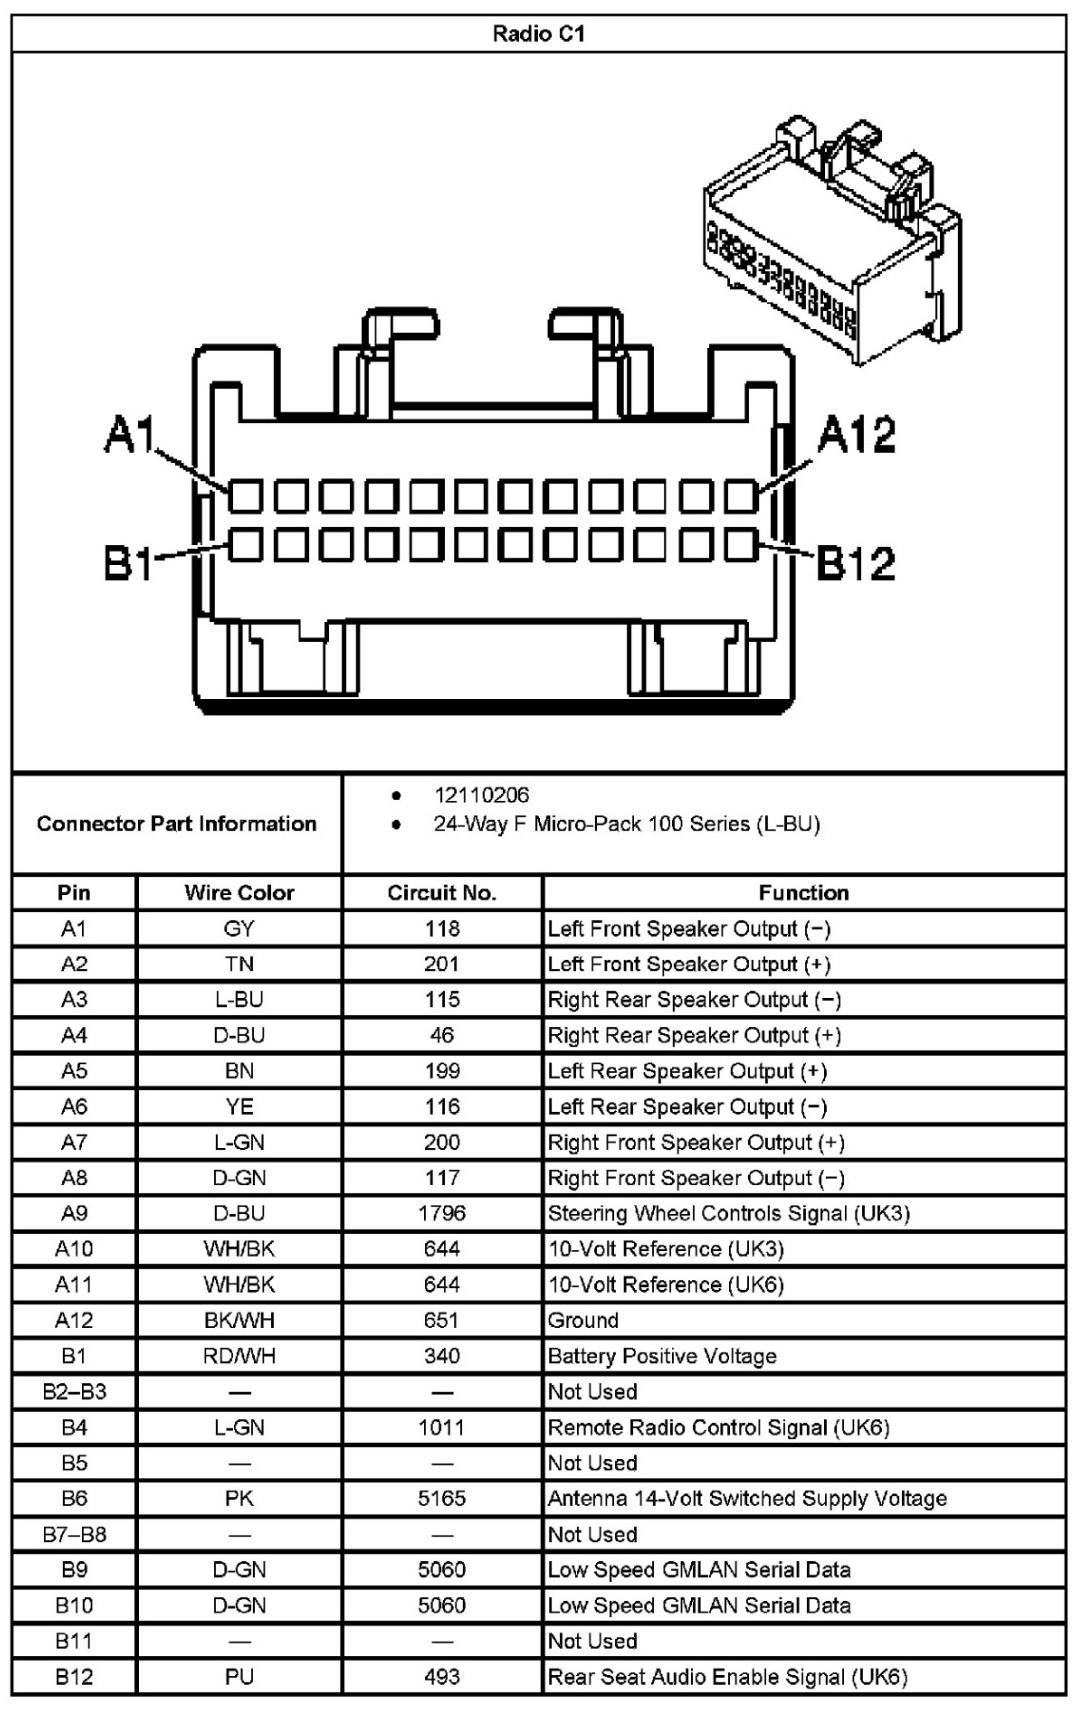 2001 Chevy Cavalier Radio Wiring Diagram - Database ...